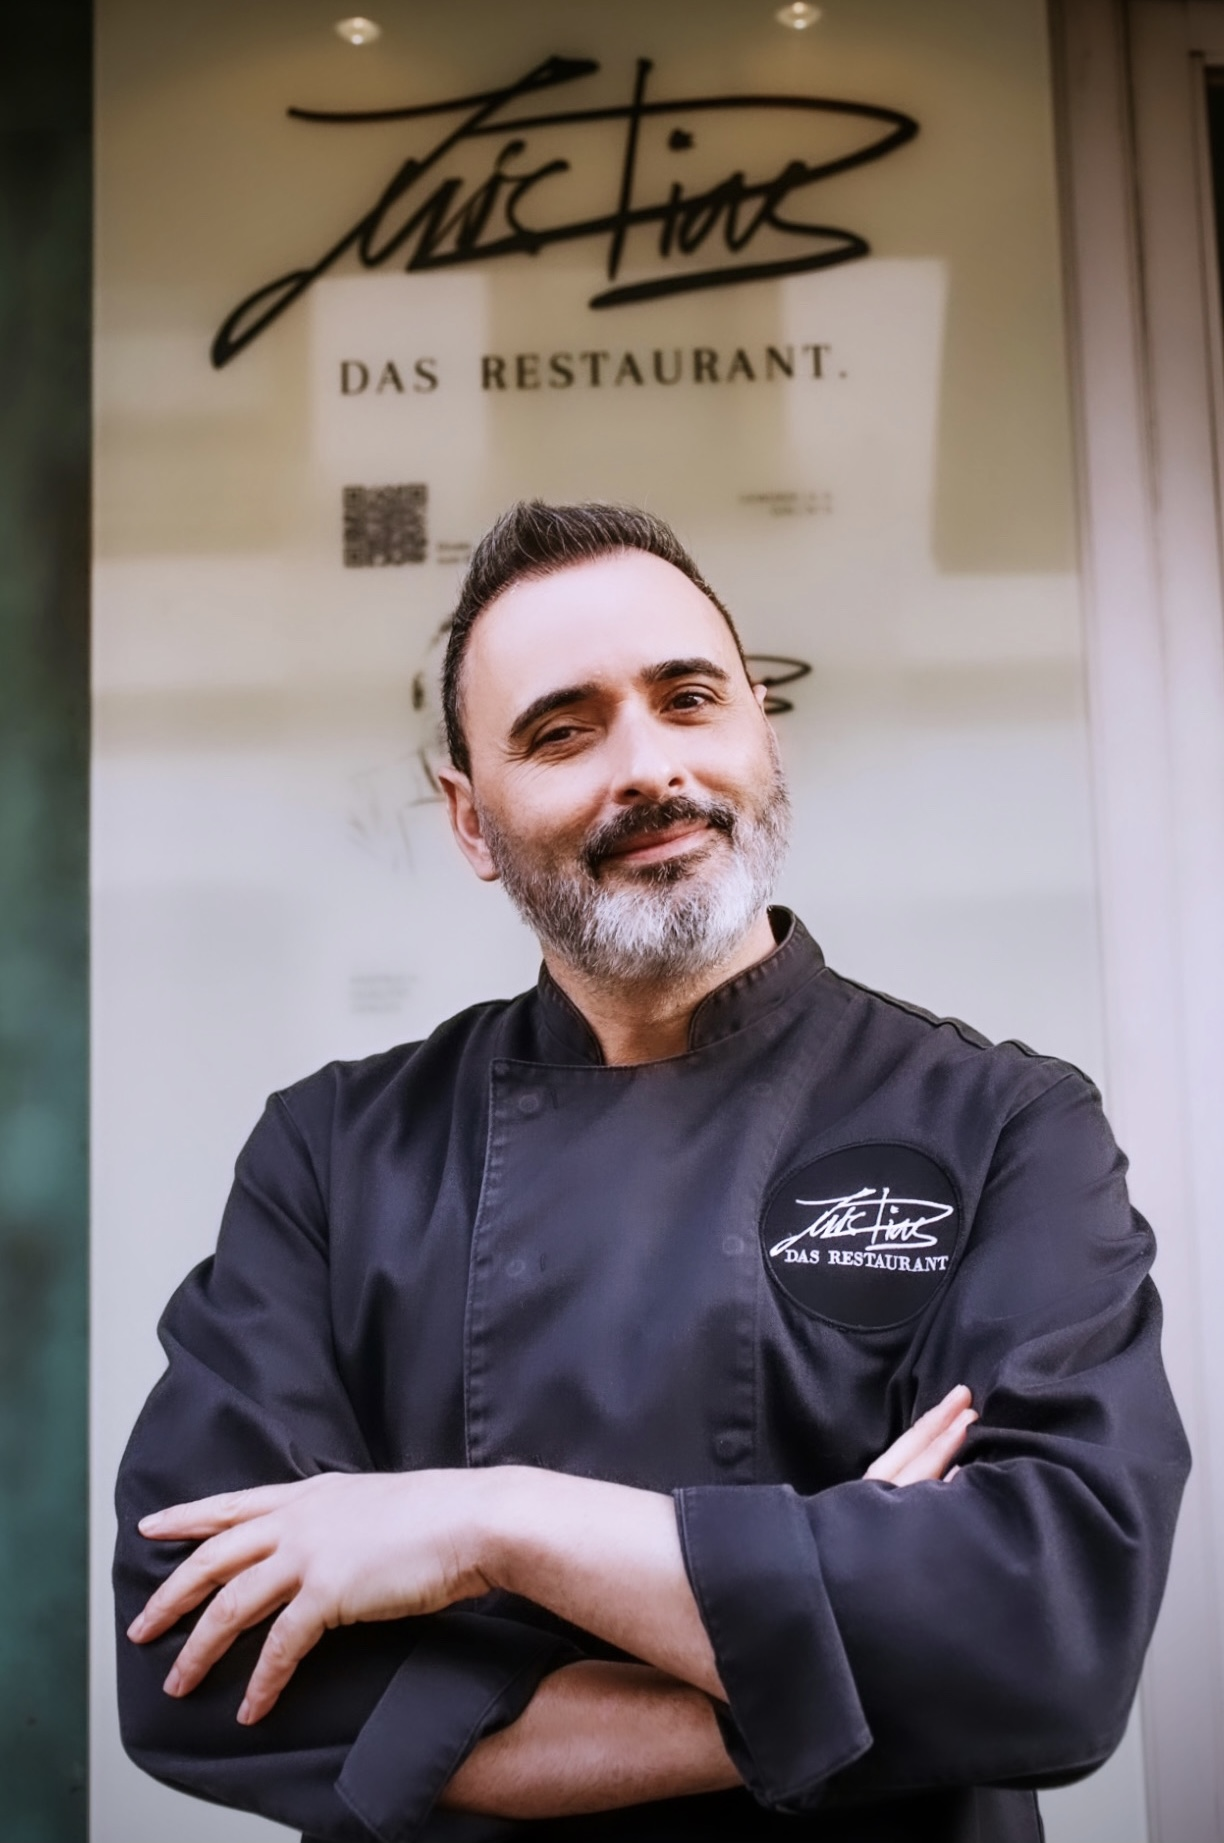 Luis Dias - Profilkoch in Köln Rodenkirchen